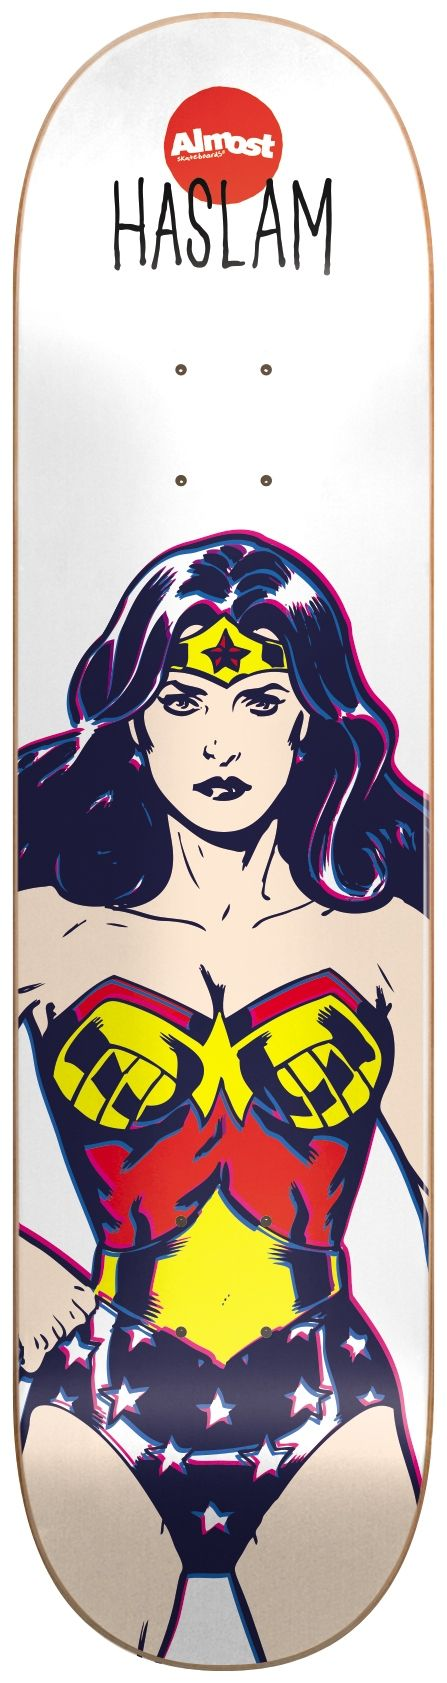 "Almost Wonder Woman R7 Skateboard Deck - Haslam 8.38"" | Almost Skateboards | Brands | Skatehut"